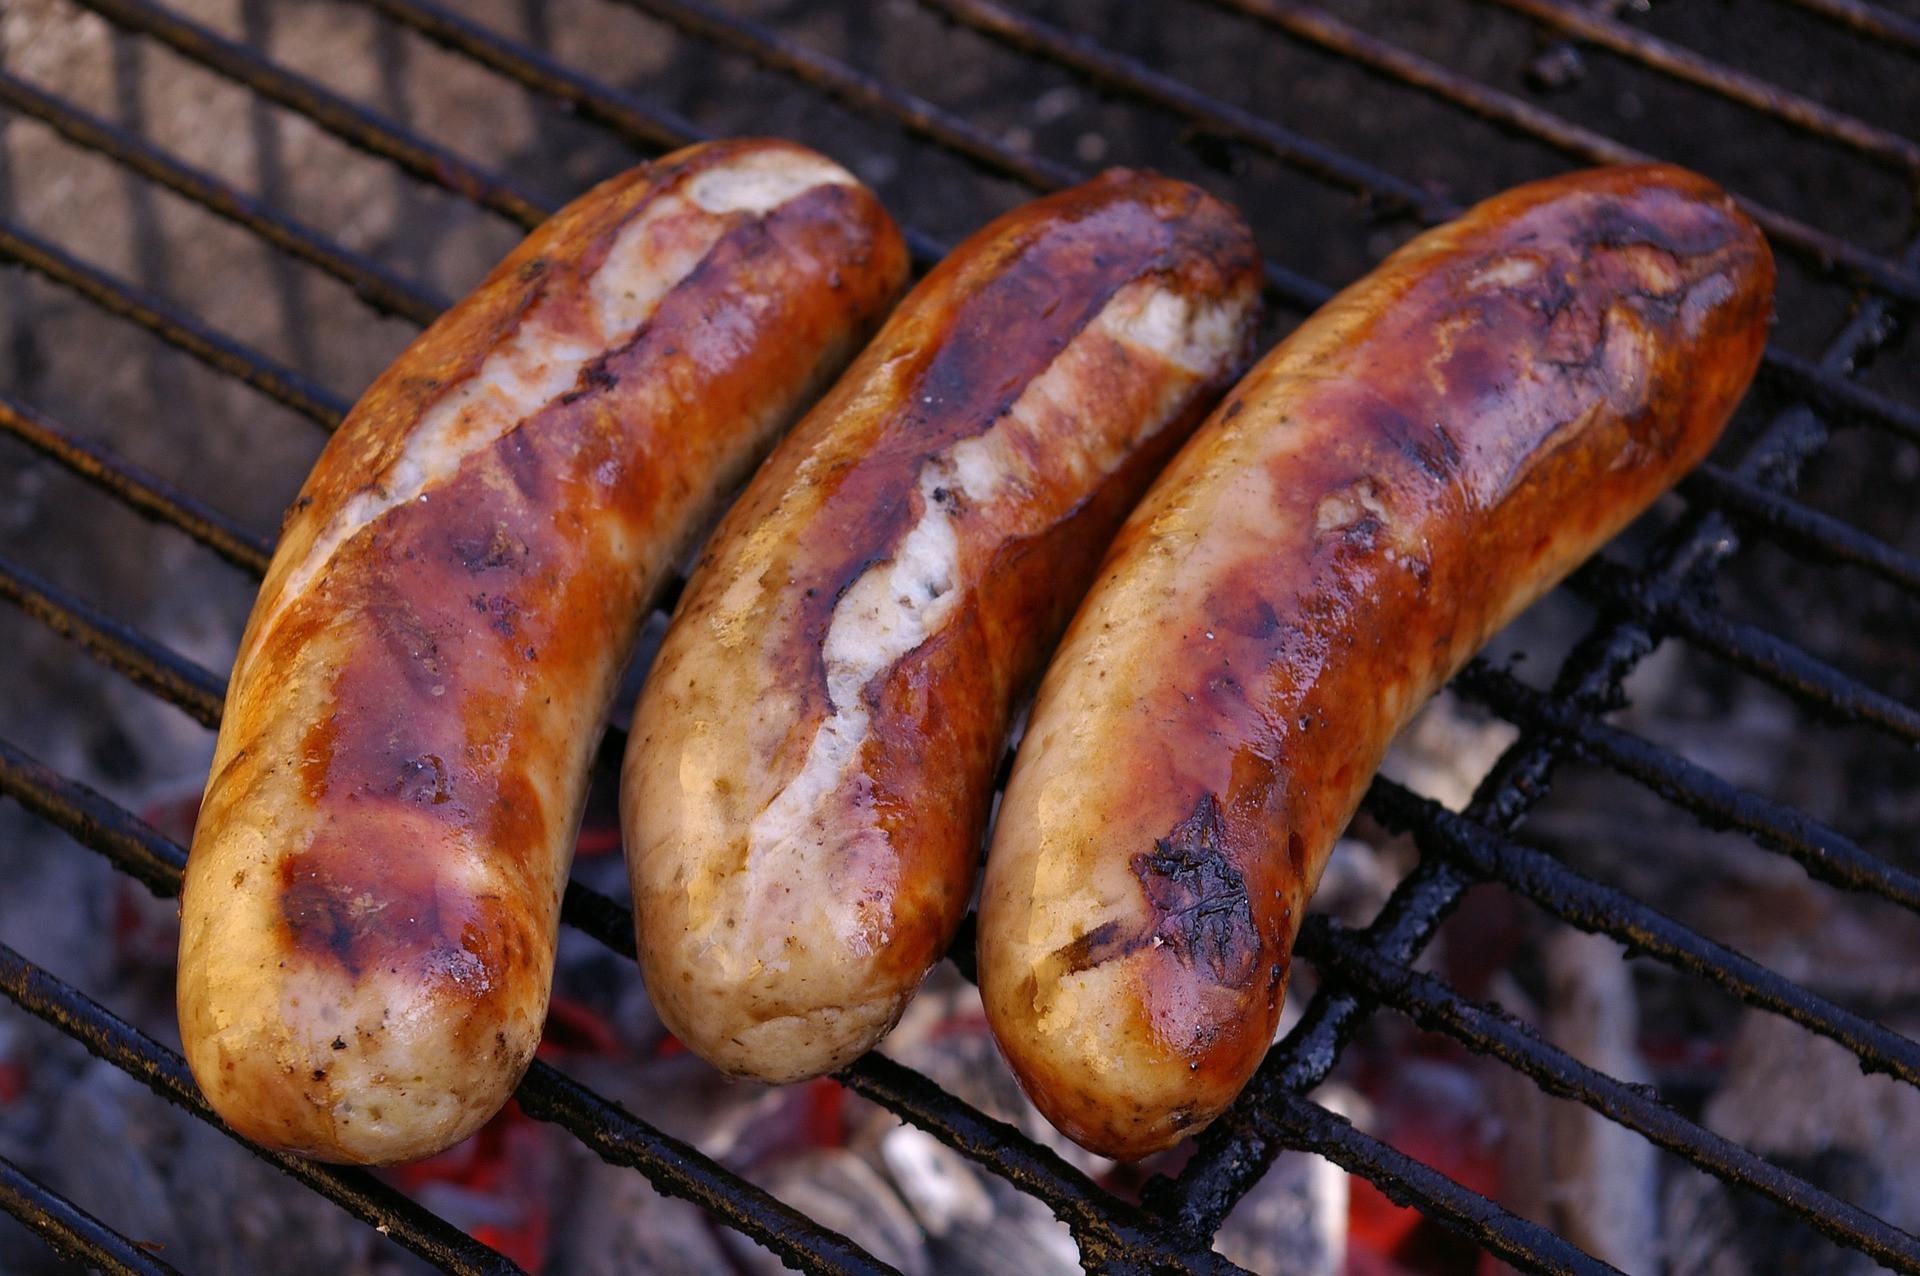 Mild Italian Link Pork Sausage (4 pack)